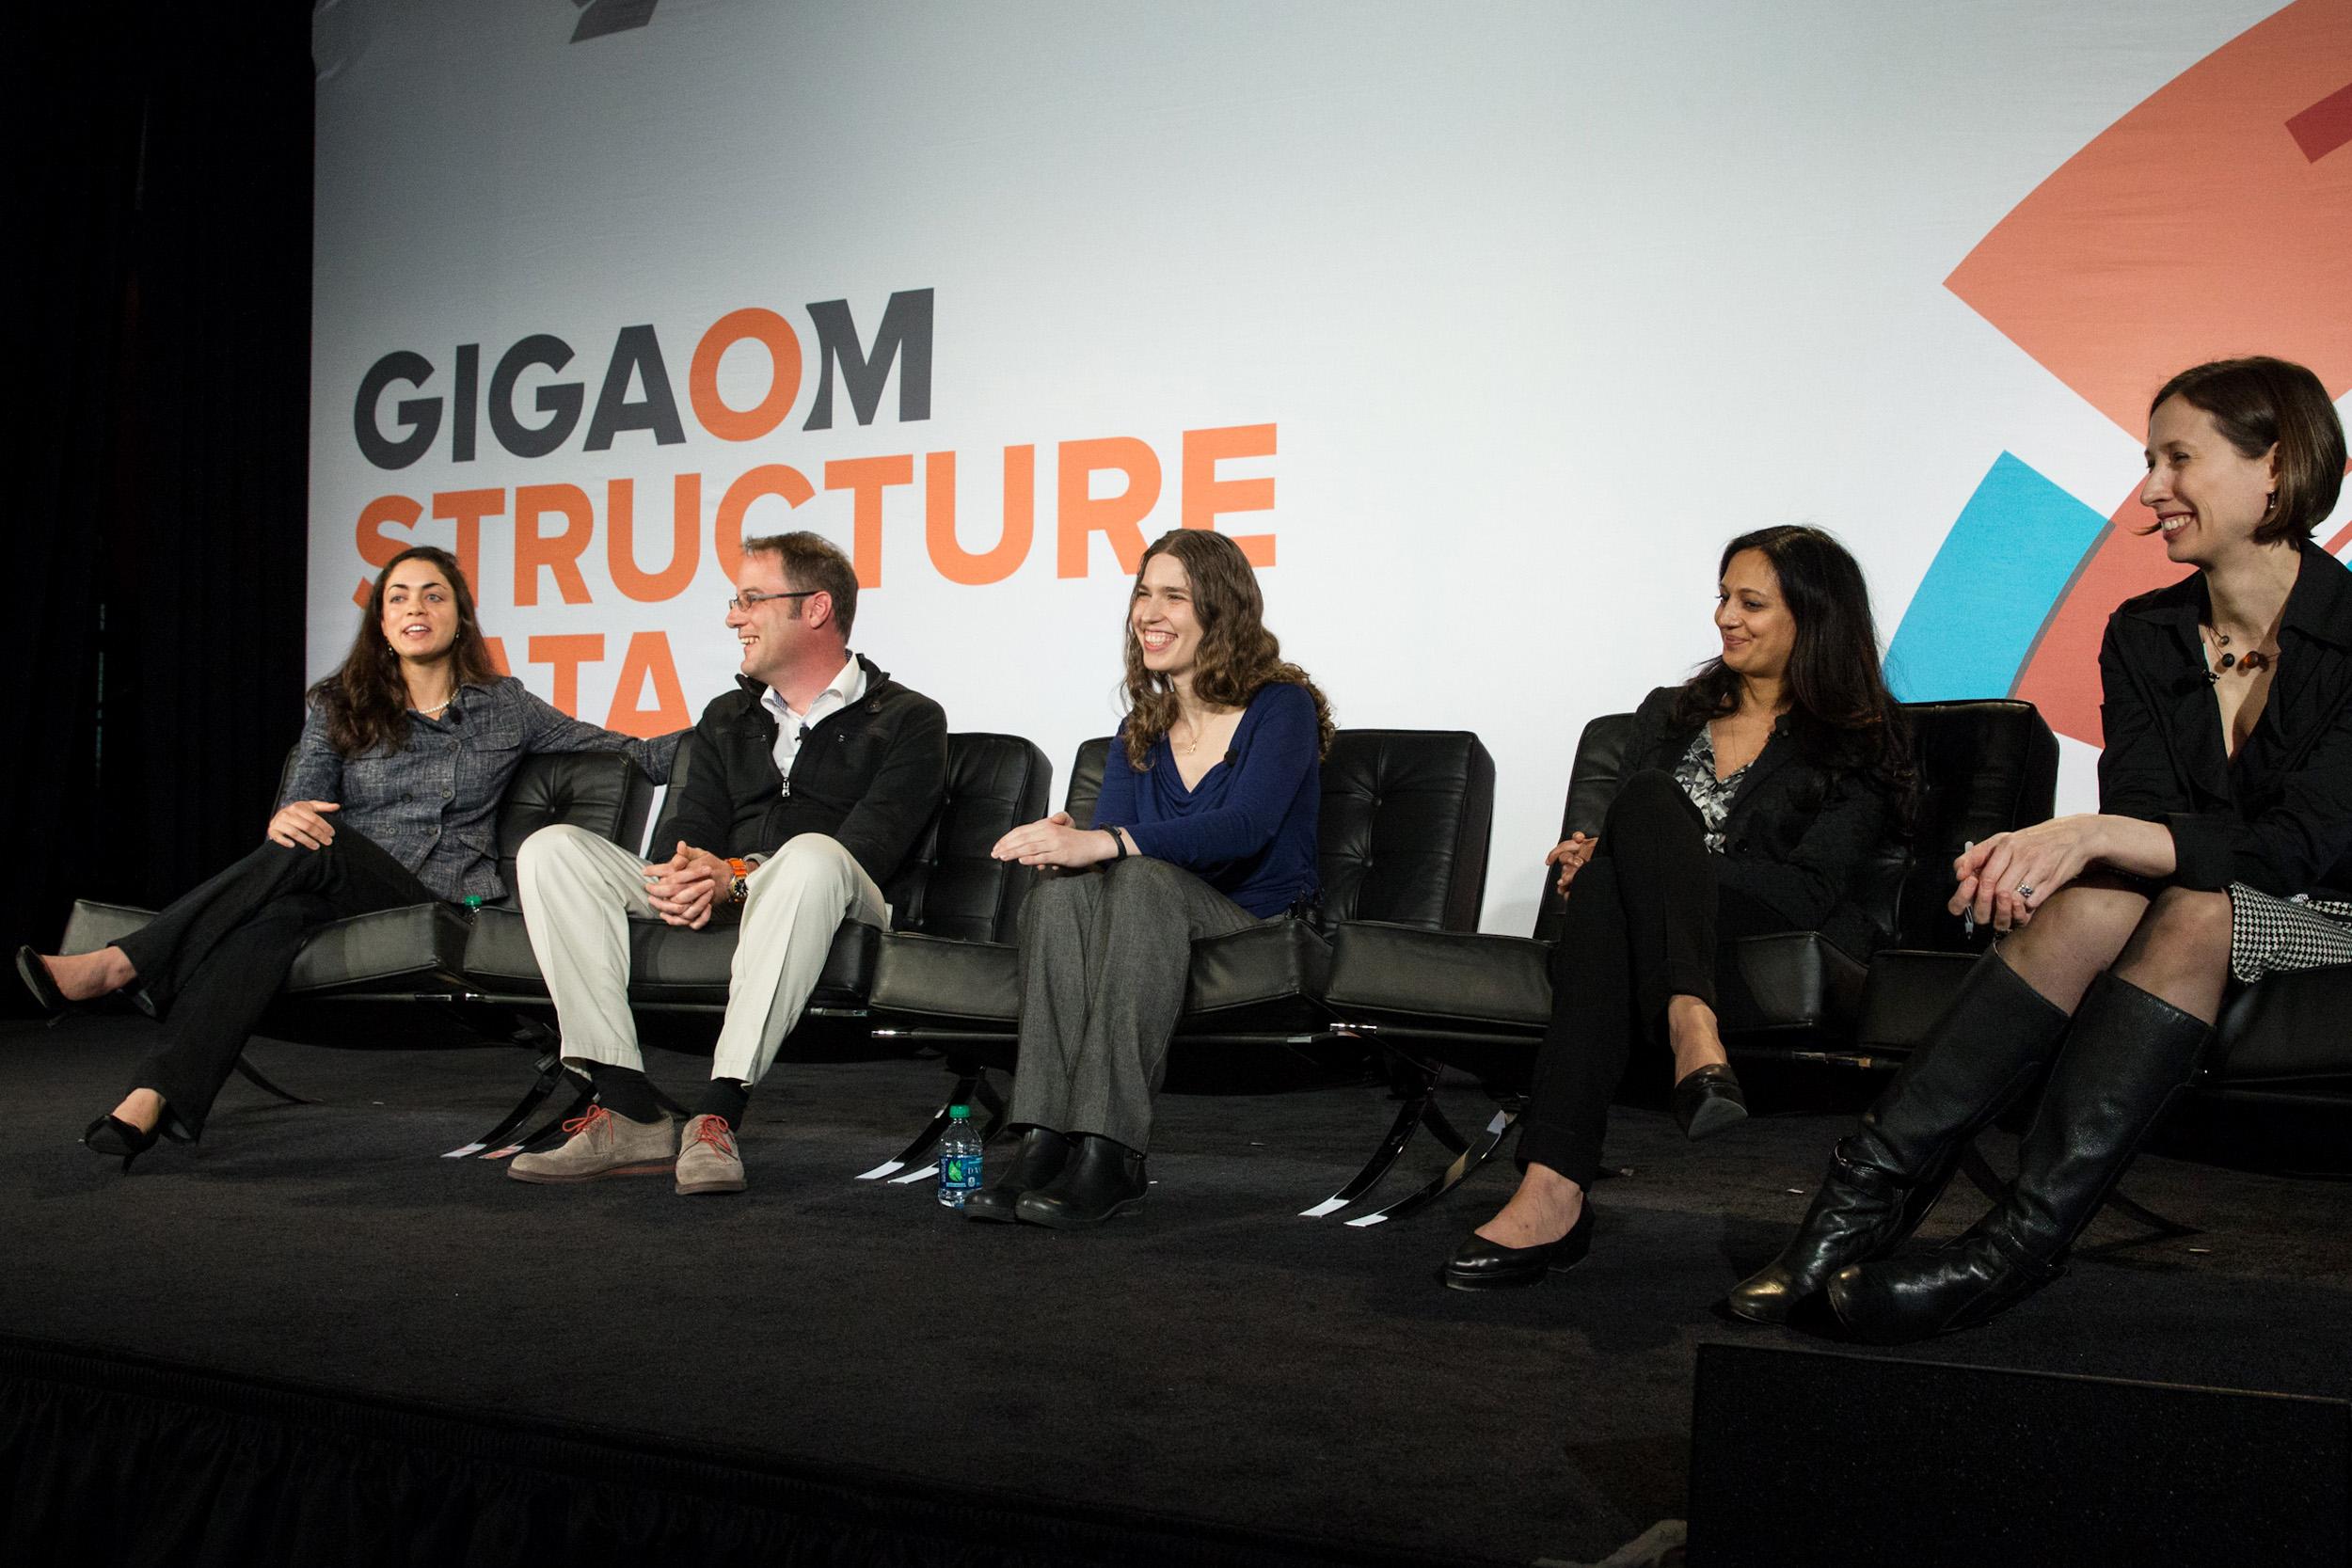 Shivon Zilis, VC, Bloomberg Beta; Sven Strohband, Partner and CTO, Khosla Ventures; Hilary Mason, Data Scientist in Residence, Accel Partners; Jalak Jobanputra, Managing Partner, FuturePerfect Ventures.